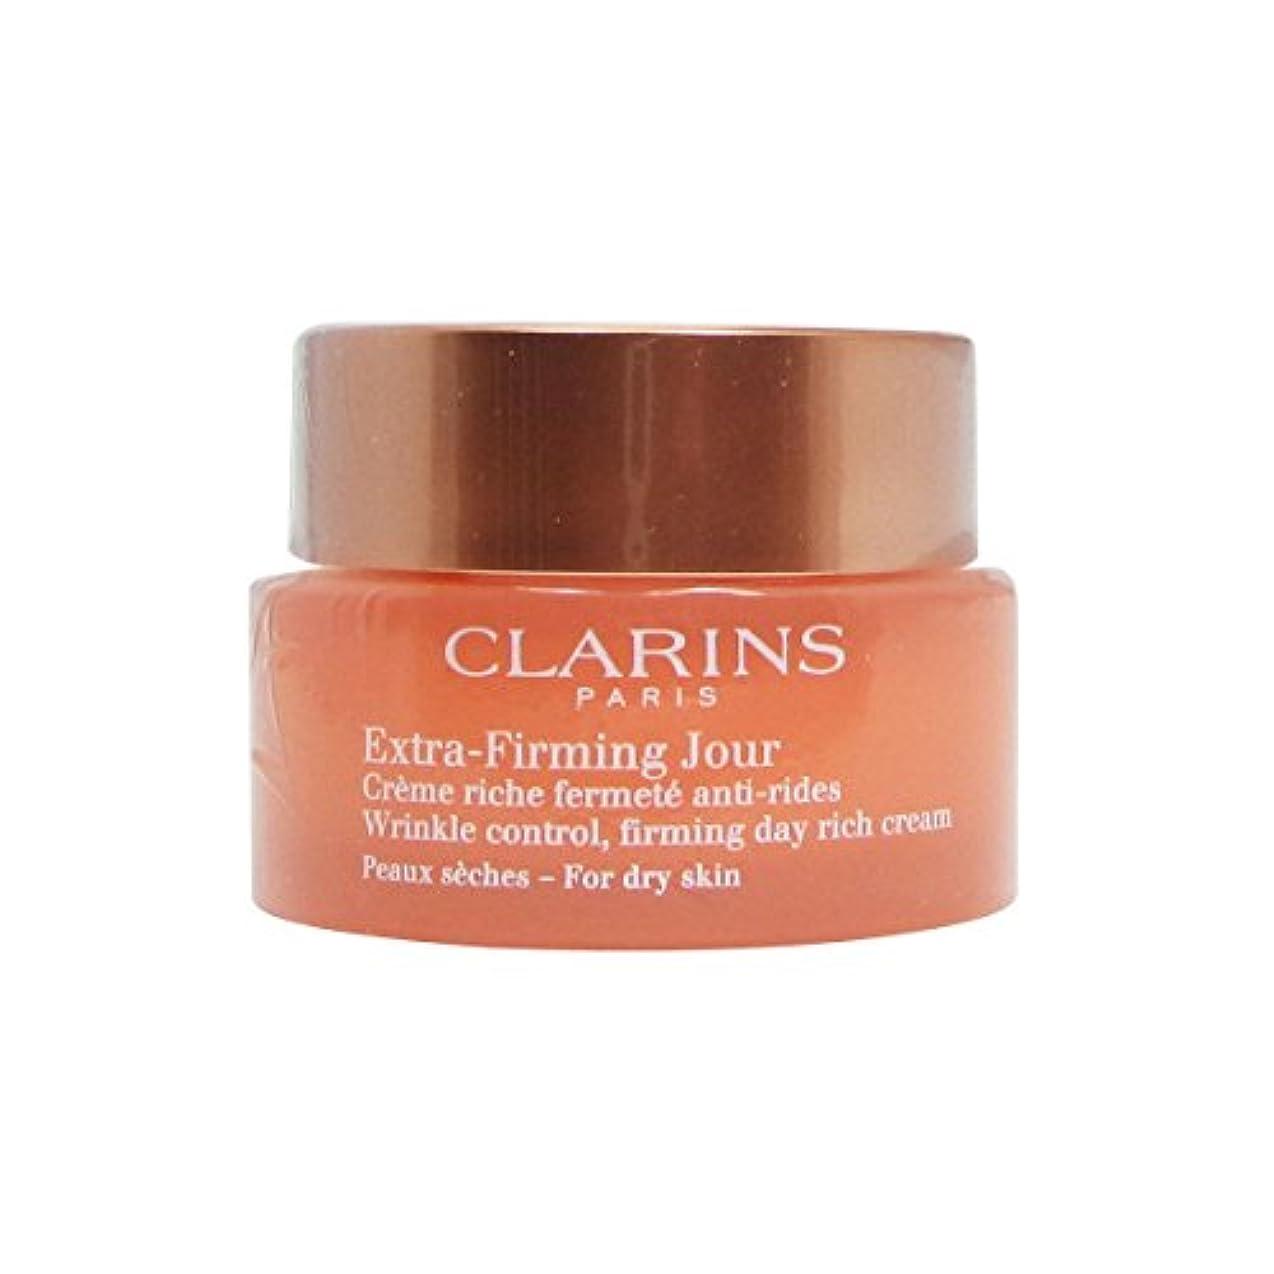 Clarins Extra-firming Dry Skin 50ml [並行輸入品]